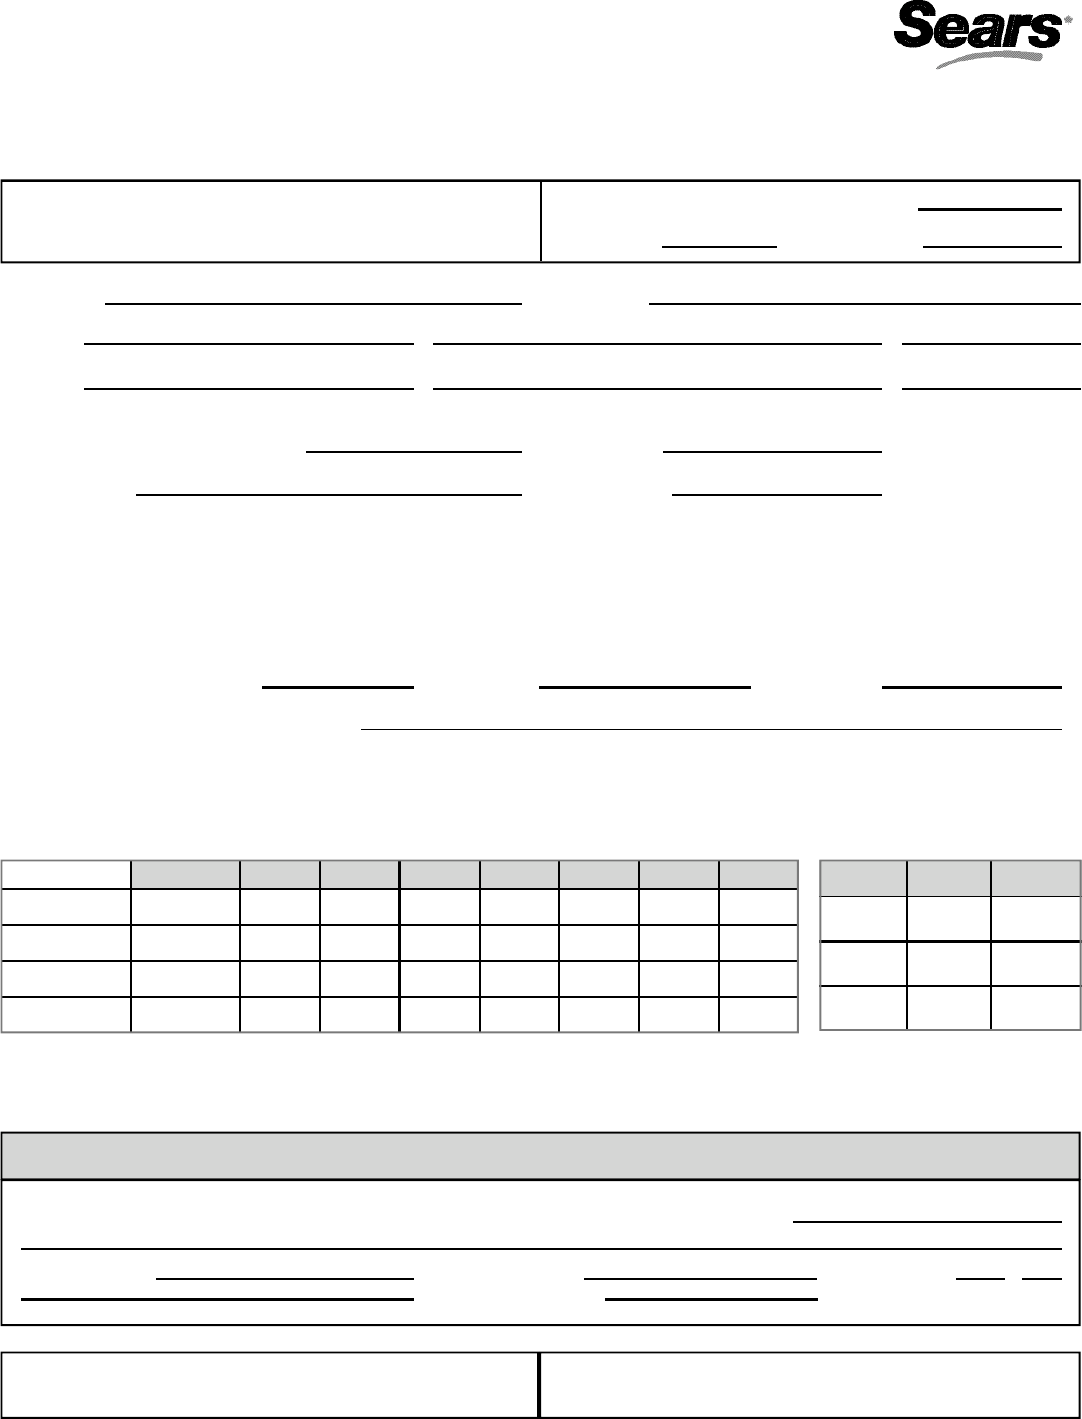 Free Printable Sears Job Application Form